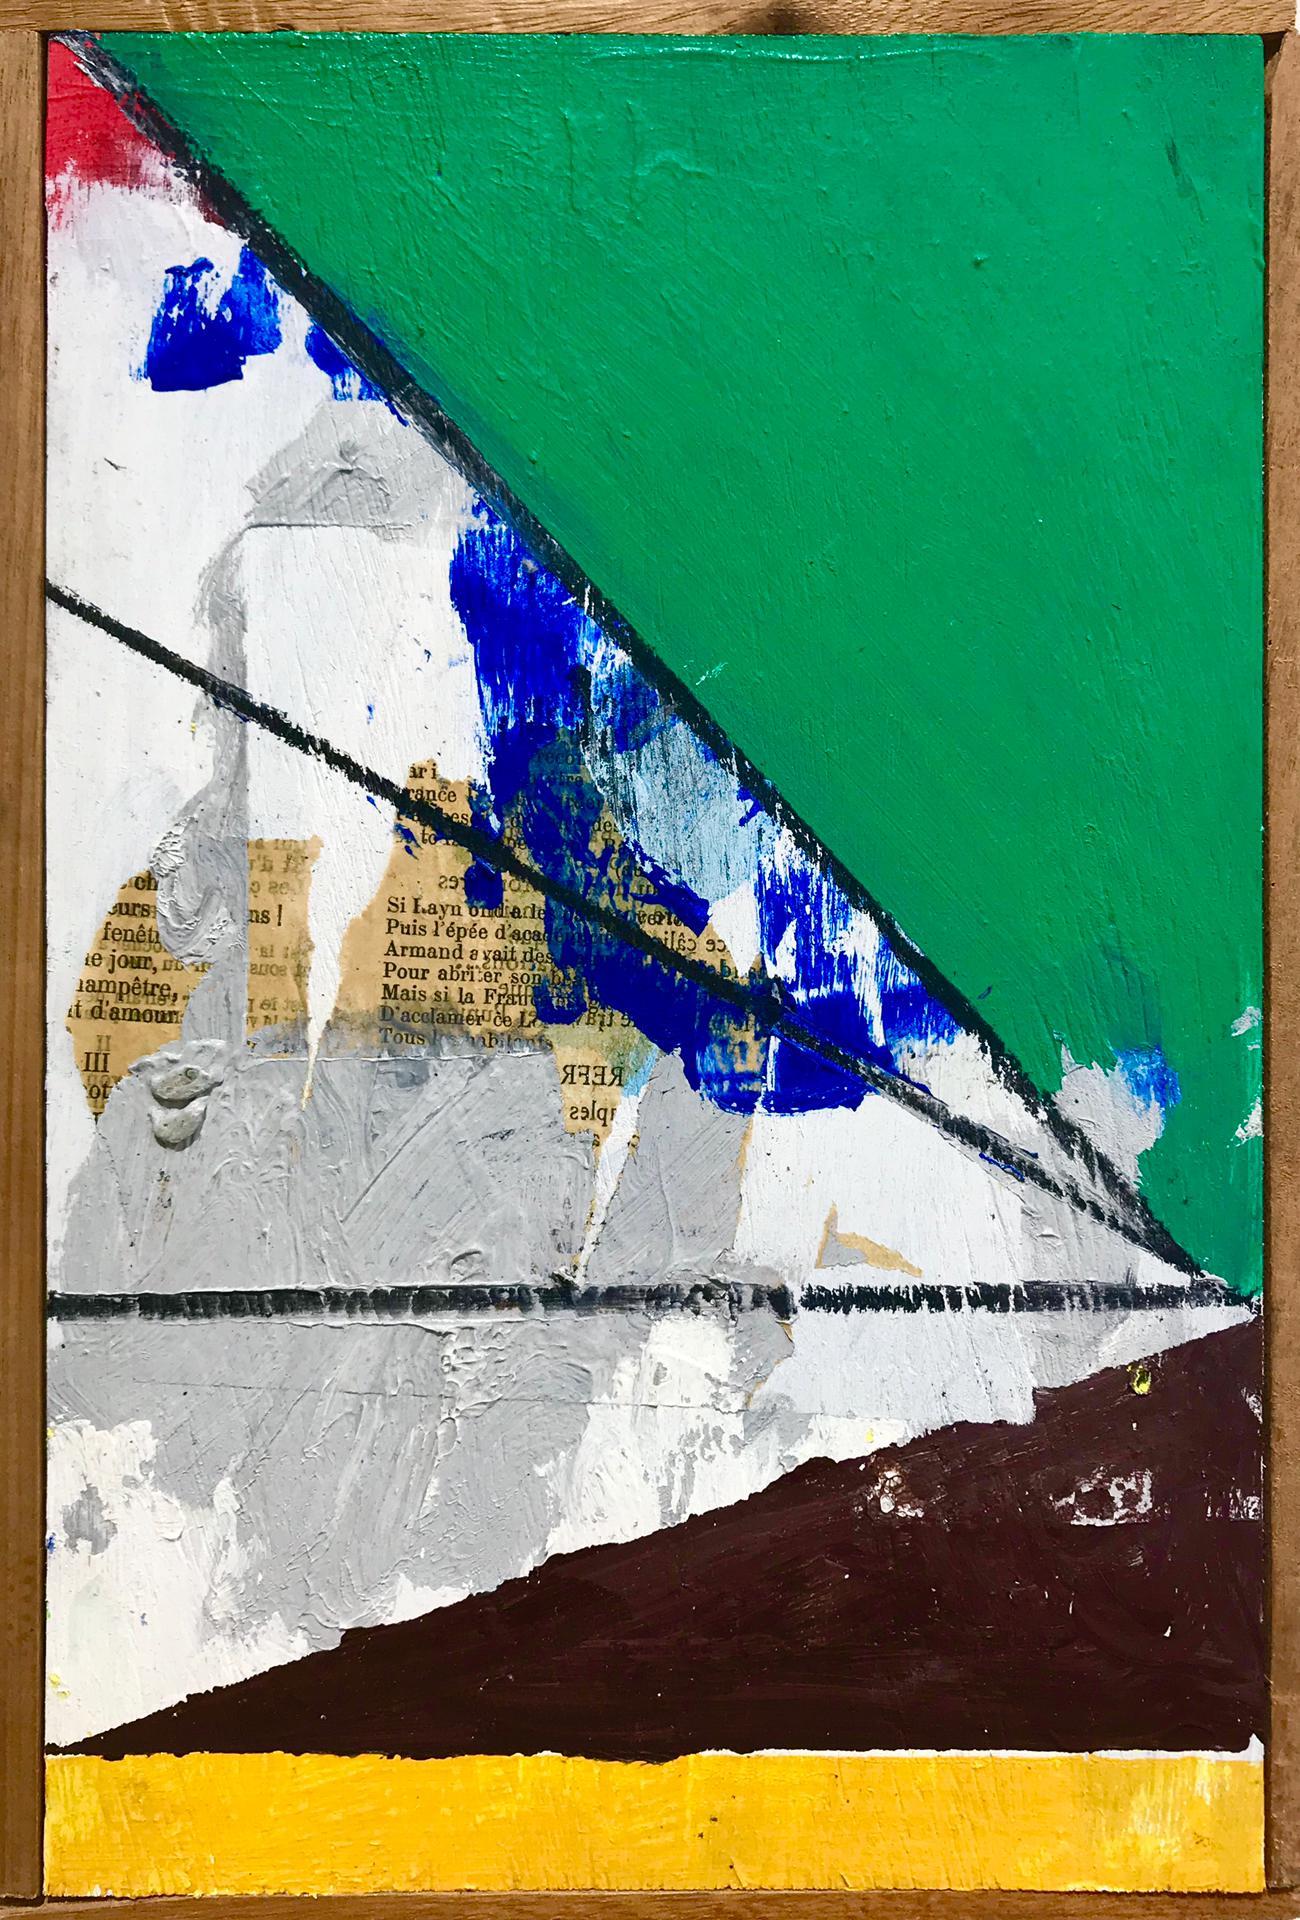 Jamaica Concreto (2018) - Antonio Bokel